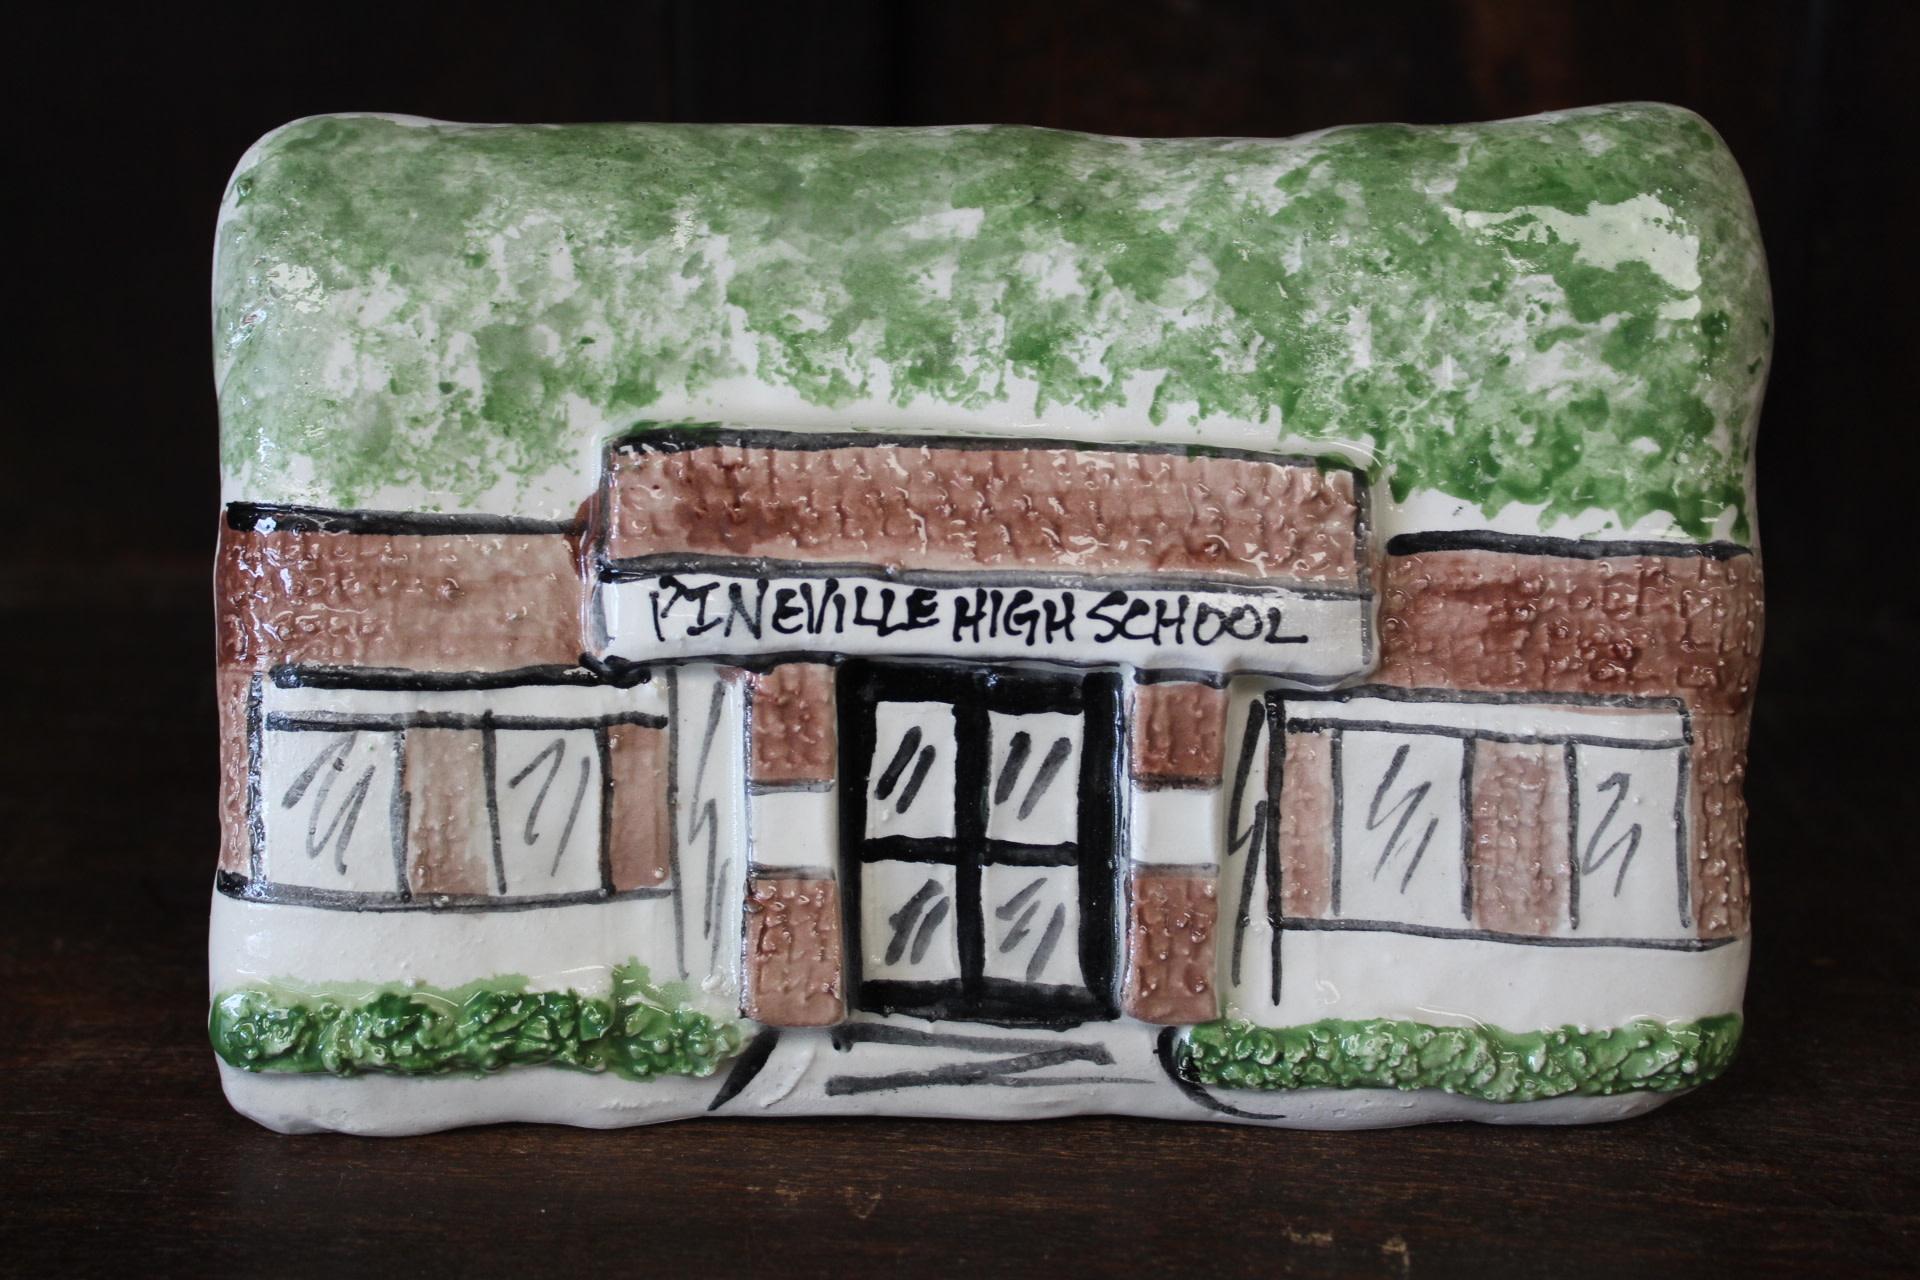 Architectural Memories Pineville High School Plaque